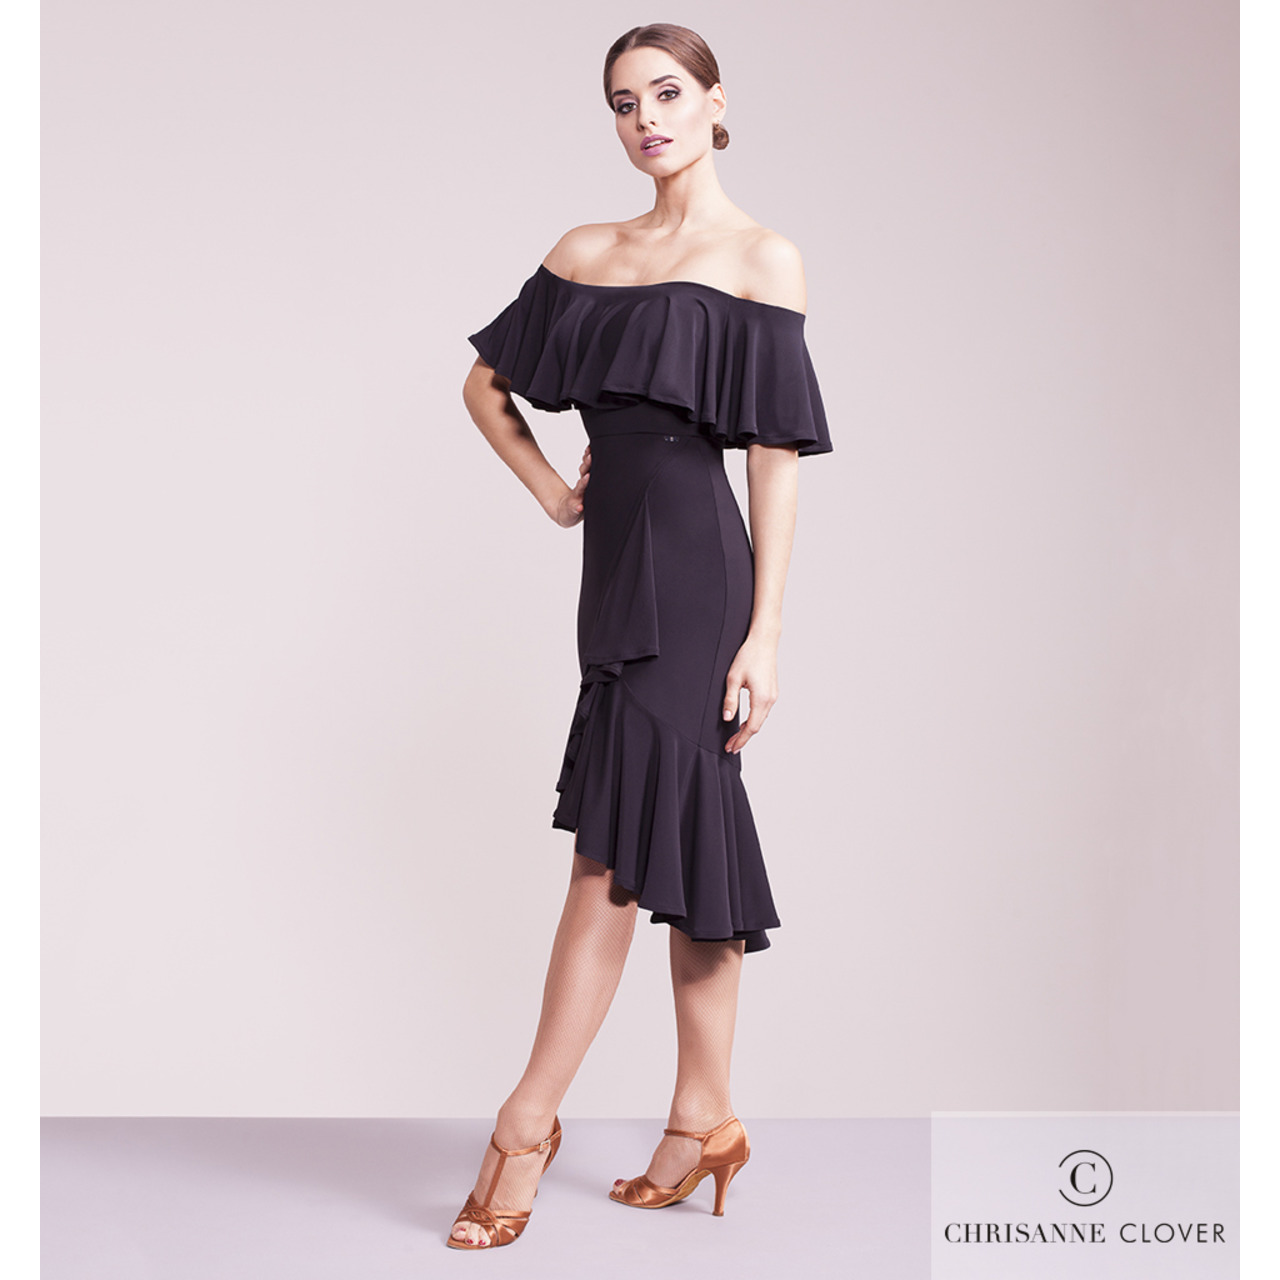 SHADOW LATIN SKIRT (Аргентинская, латинская юбка)